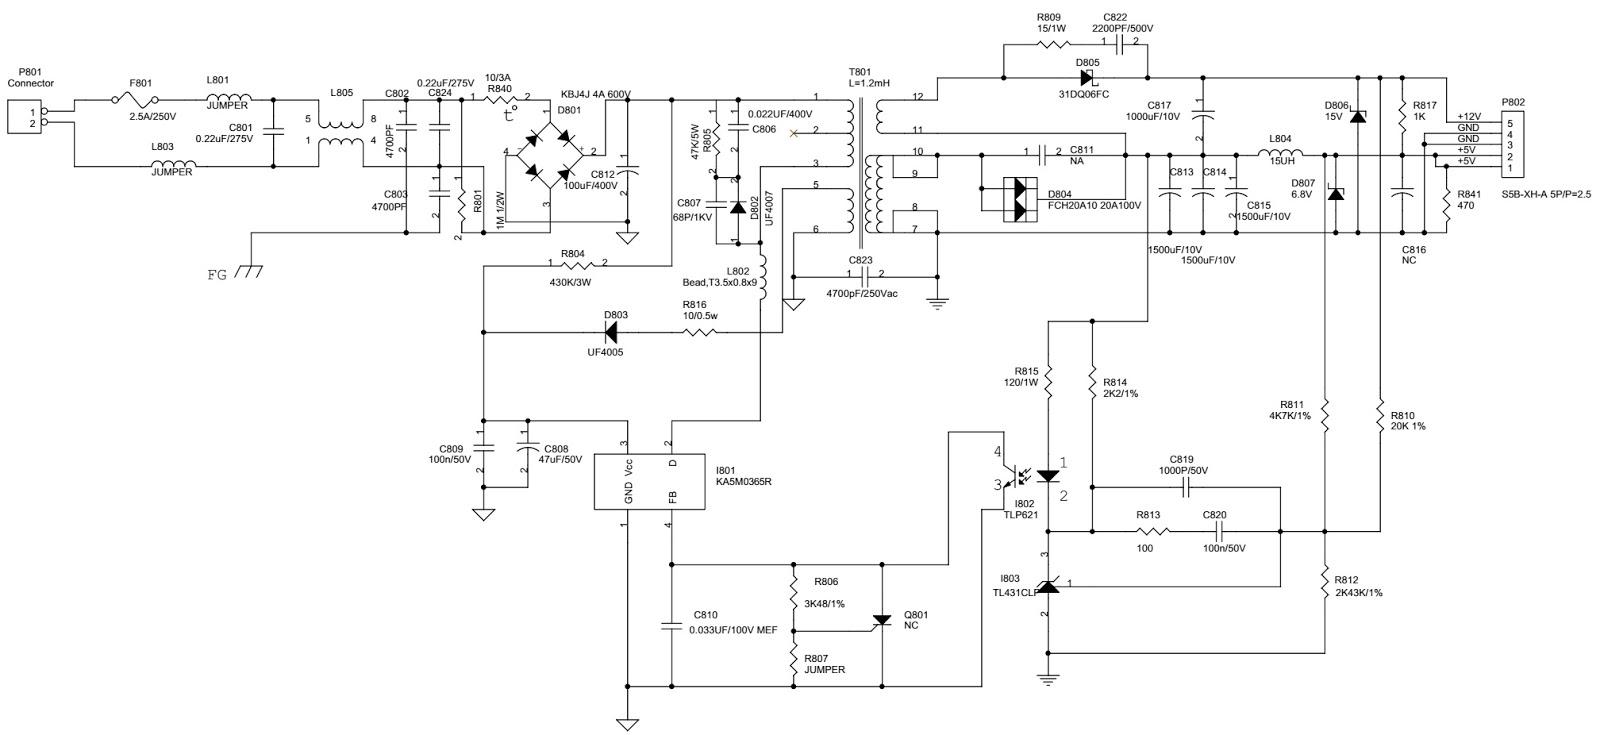 Schematic Diagrams  Aoc Al512  U2013 Aoc Al513  U2013 15 Inch Tft Lcd Monitor  U2013 Circuit Diagram